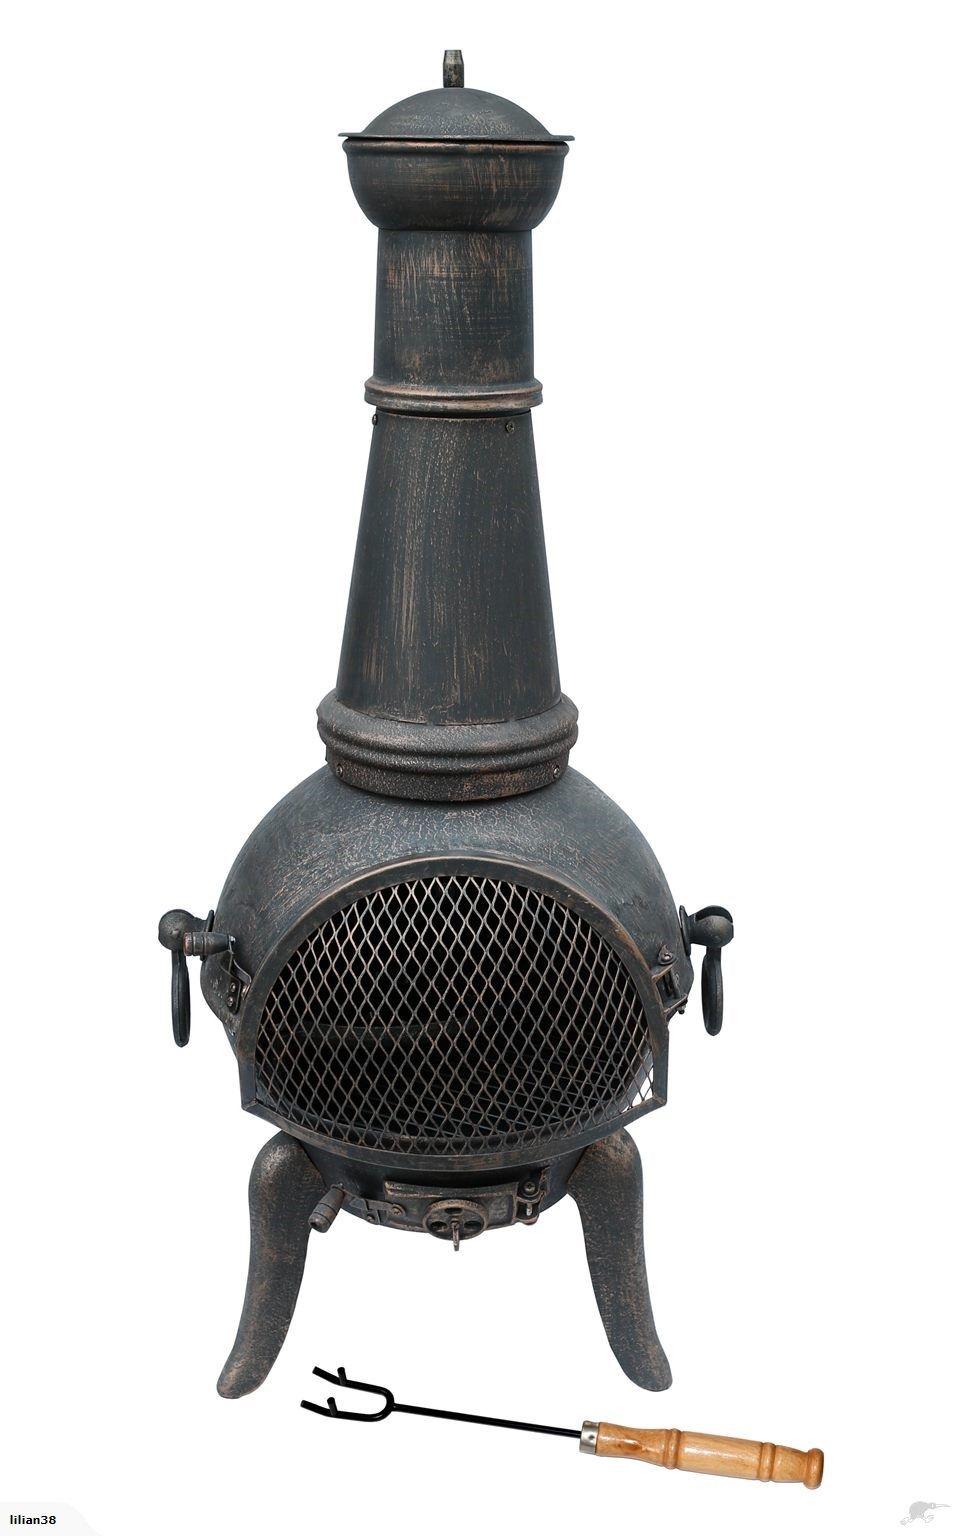 Cast Iron Chiminea Outdoor Patio Yard Fire Pit firewood Burnning W// log holder